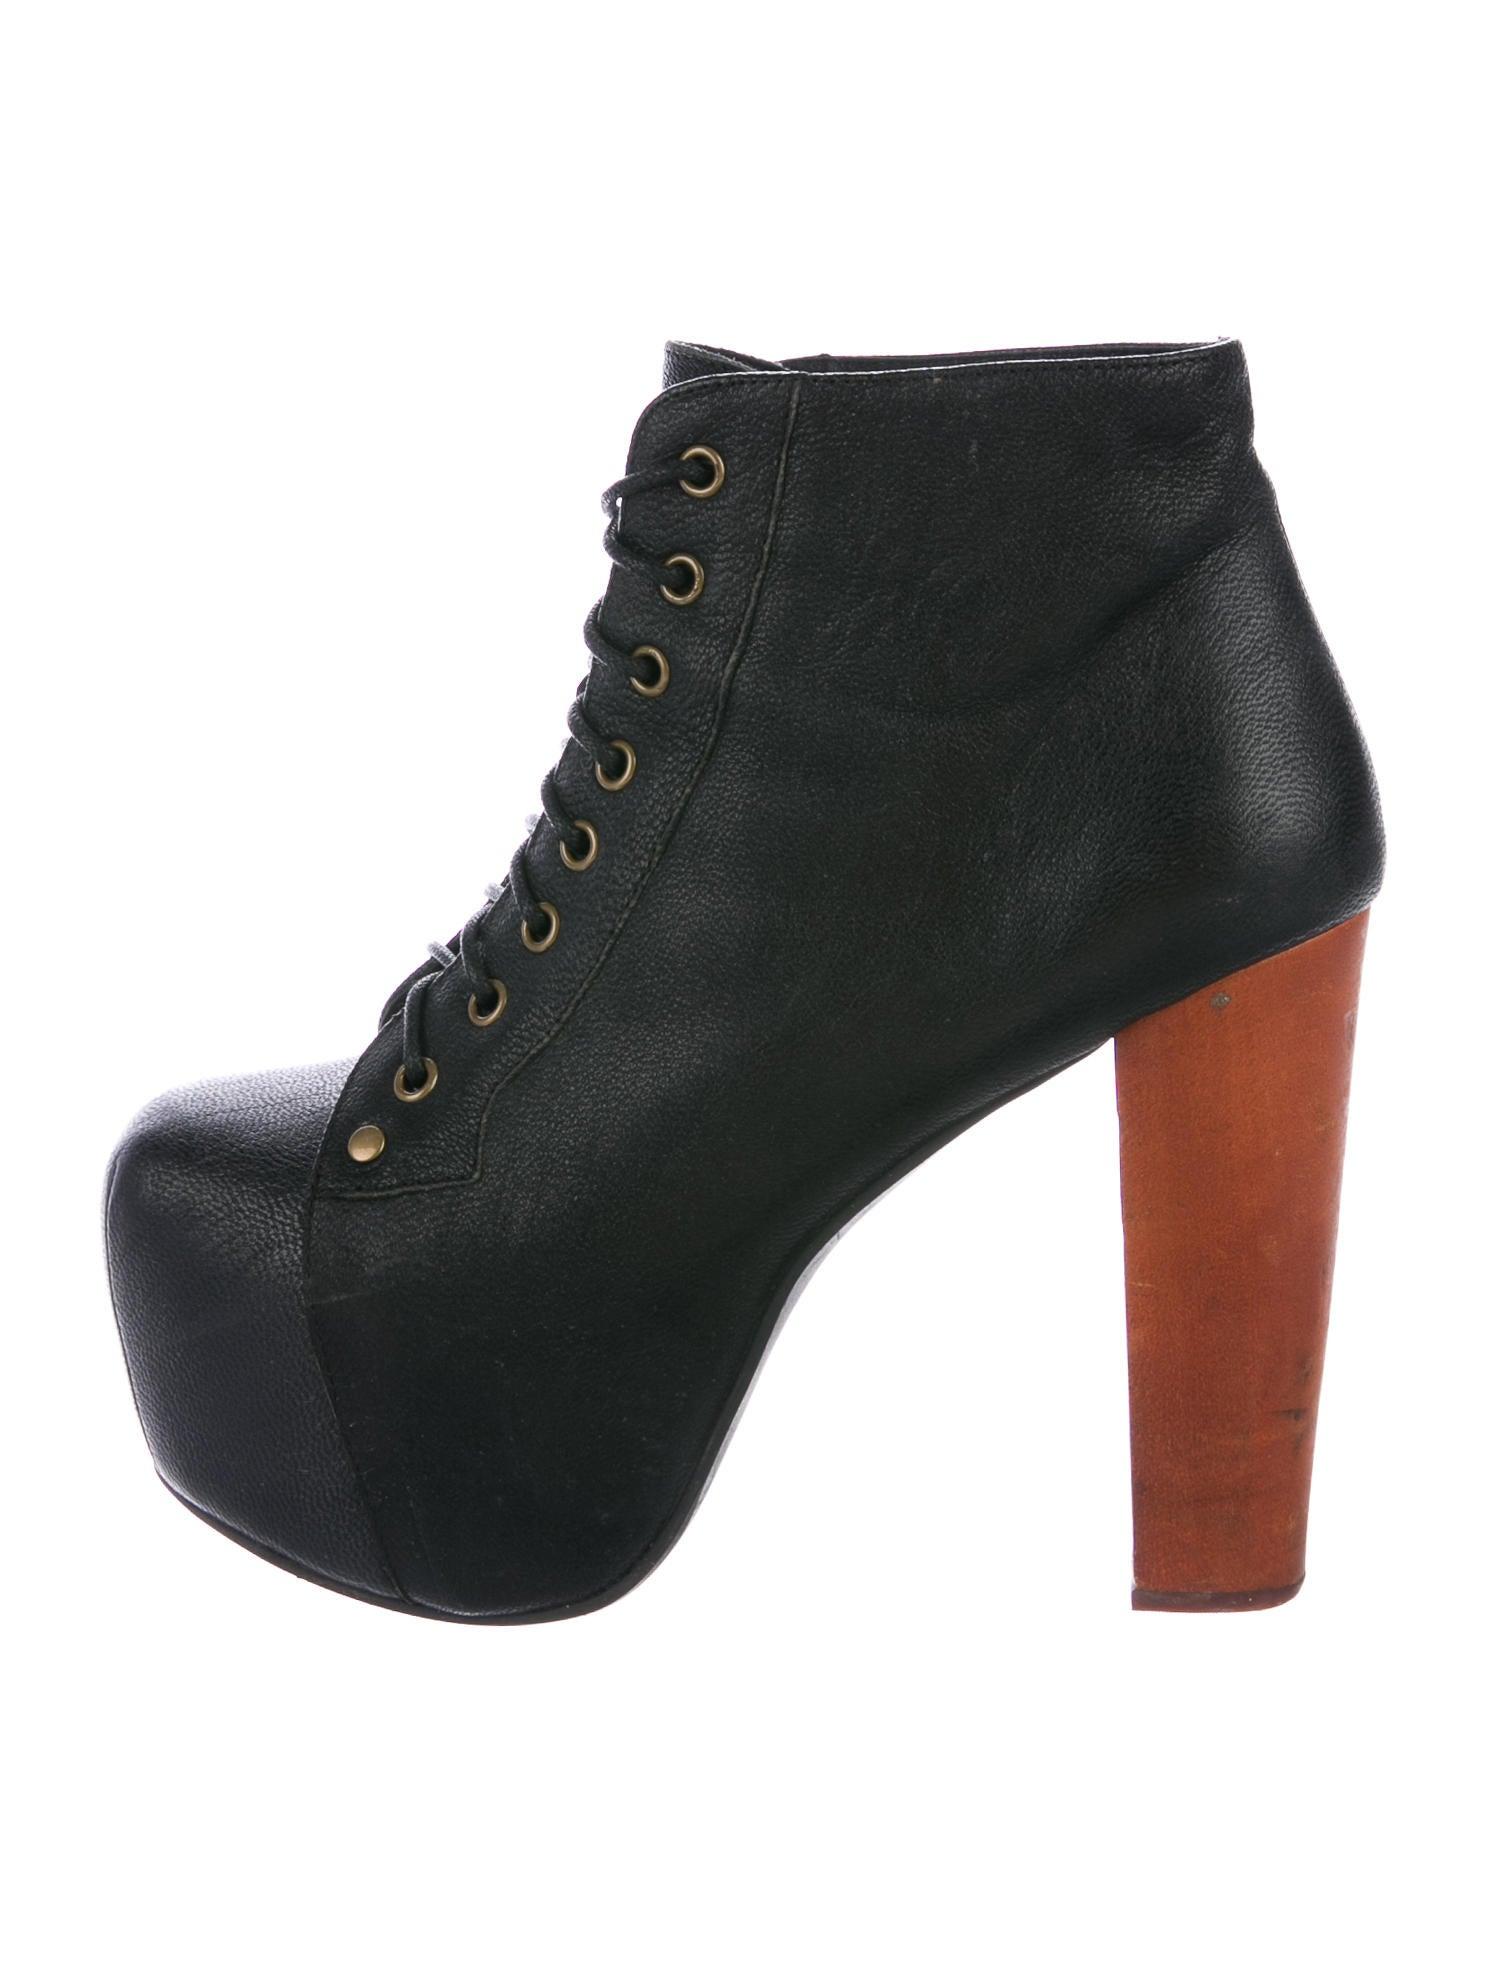 jeffrey campbell lita platform ankle booties shoes wjf20007 the realreal. Black Bedroom Furniture Sets. Home Design Ideas